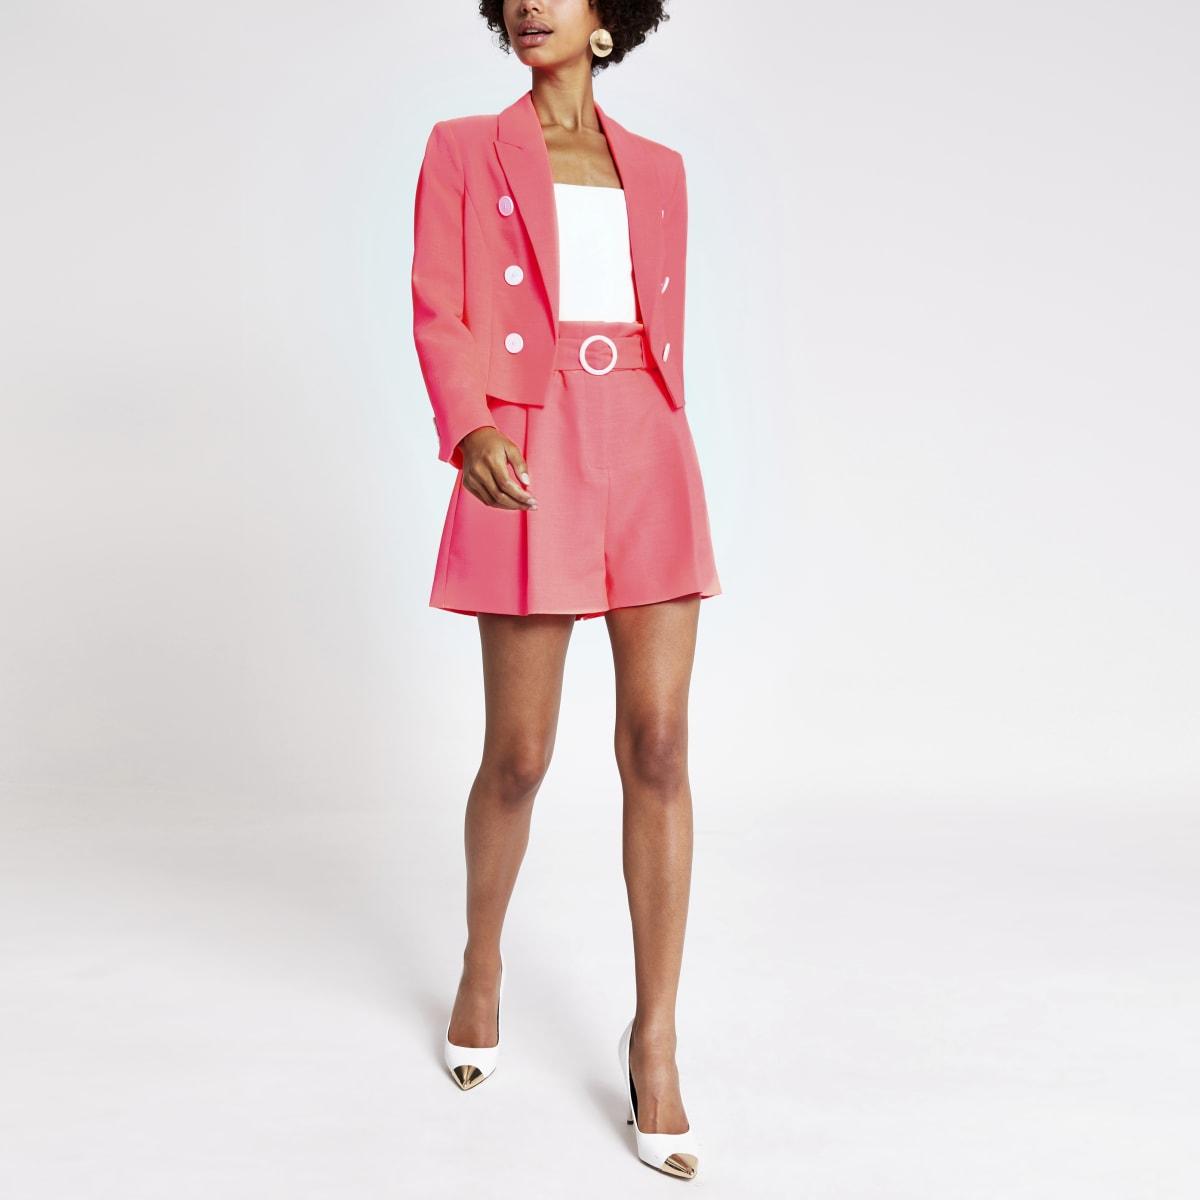 Neon pink cropped blazer